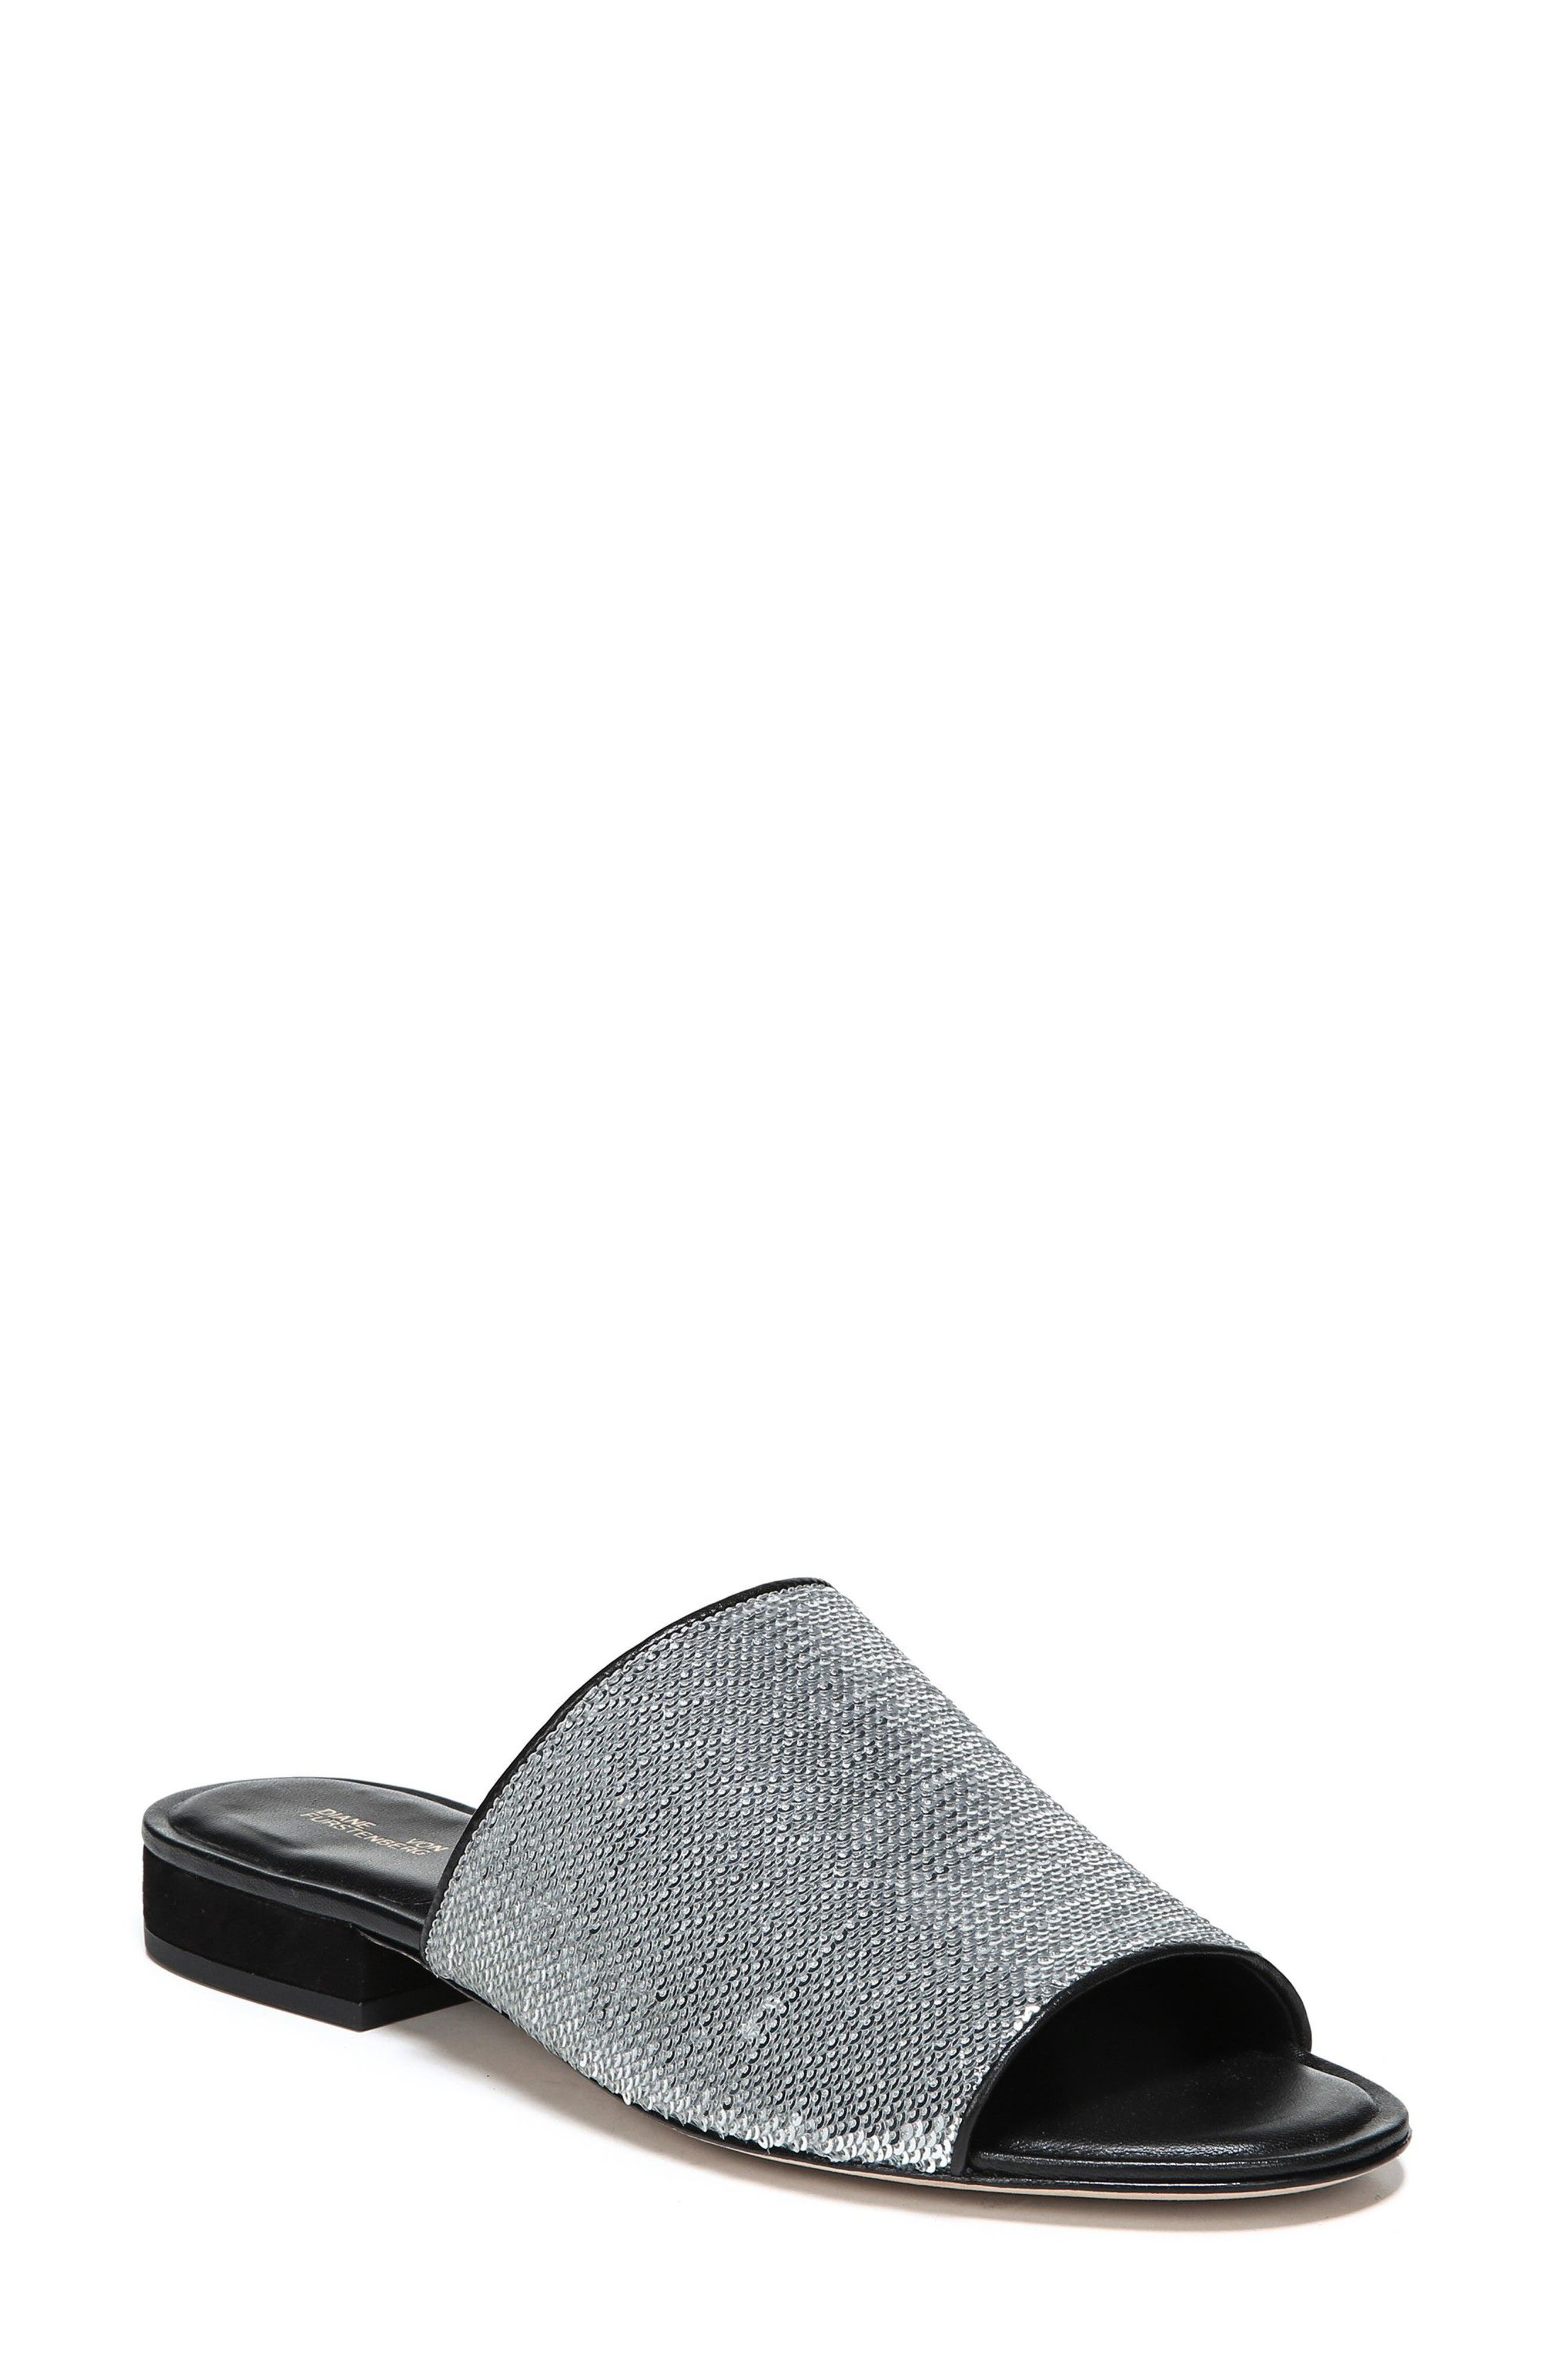 Alternate Image 1 Selected - Diane von Furstenberg Samassi 1 Slide Sandal (Women)